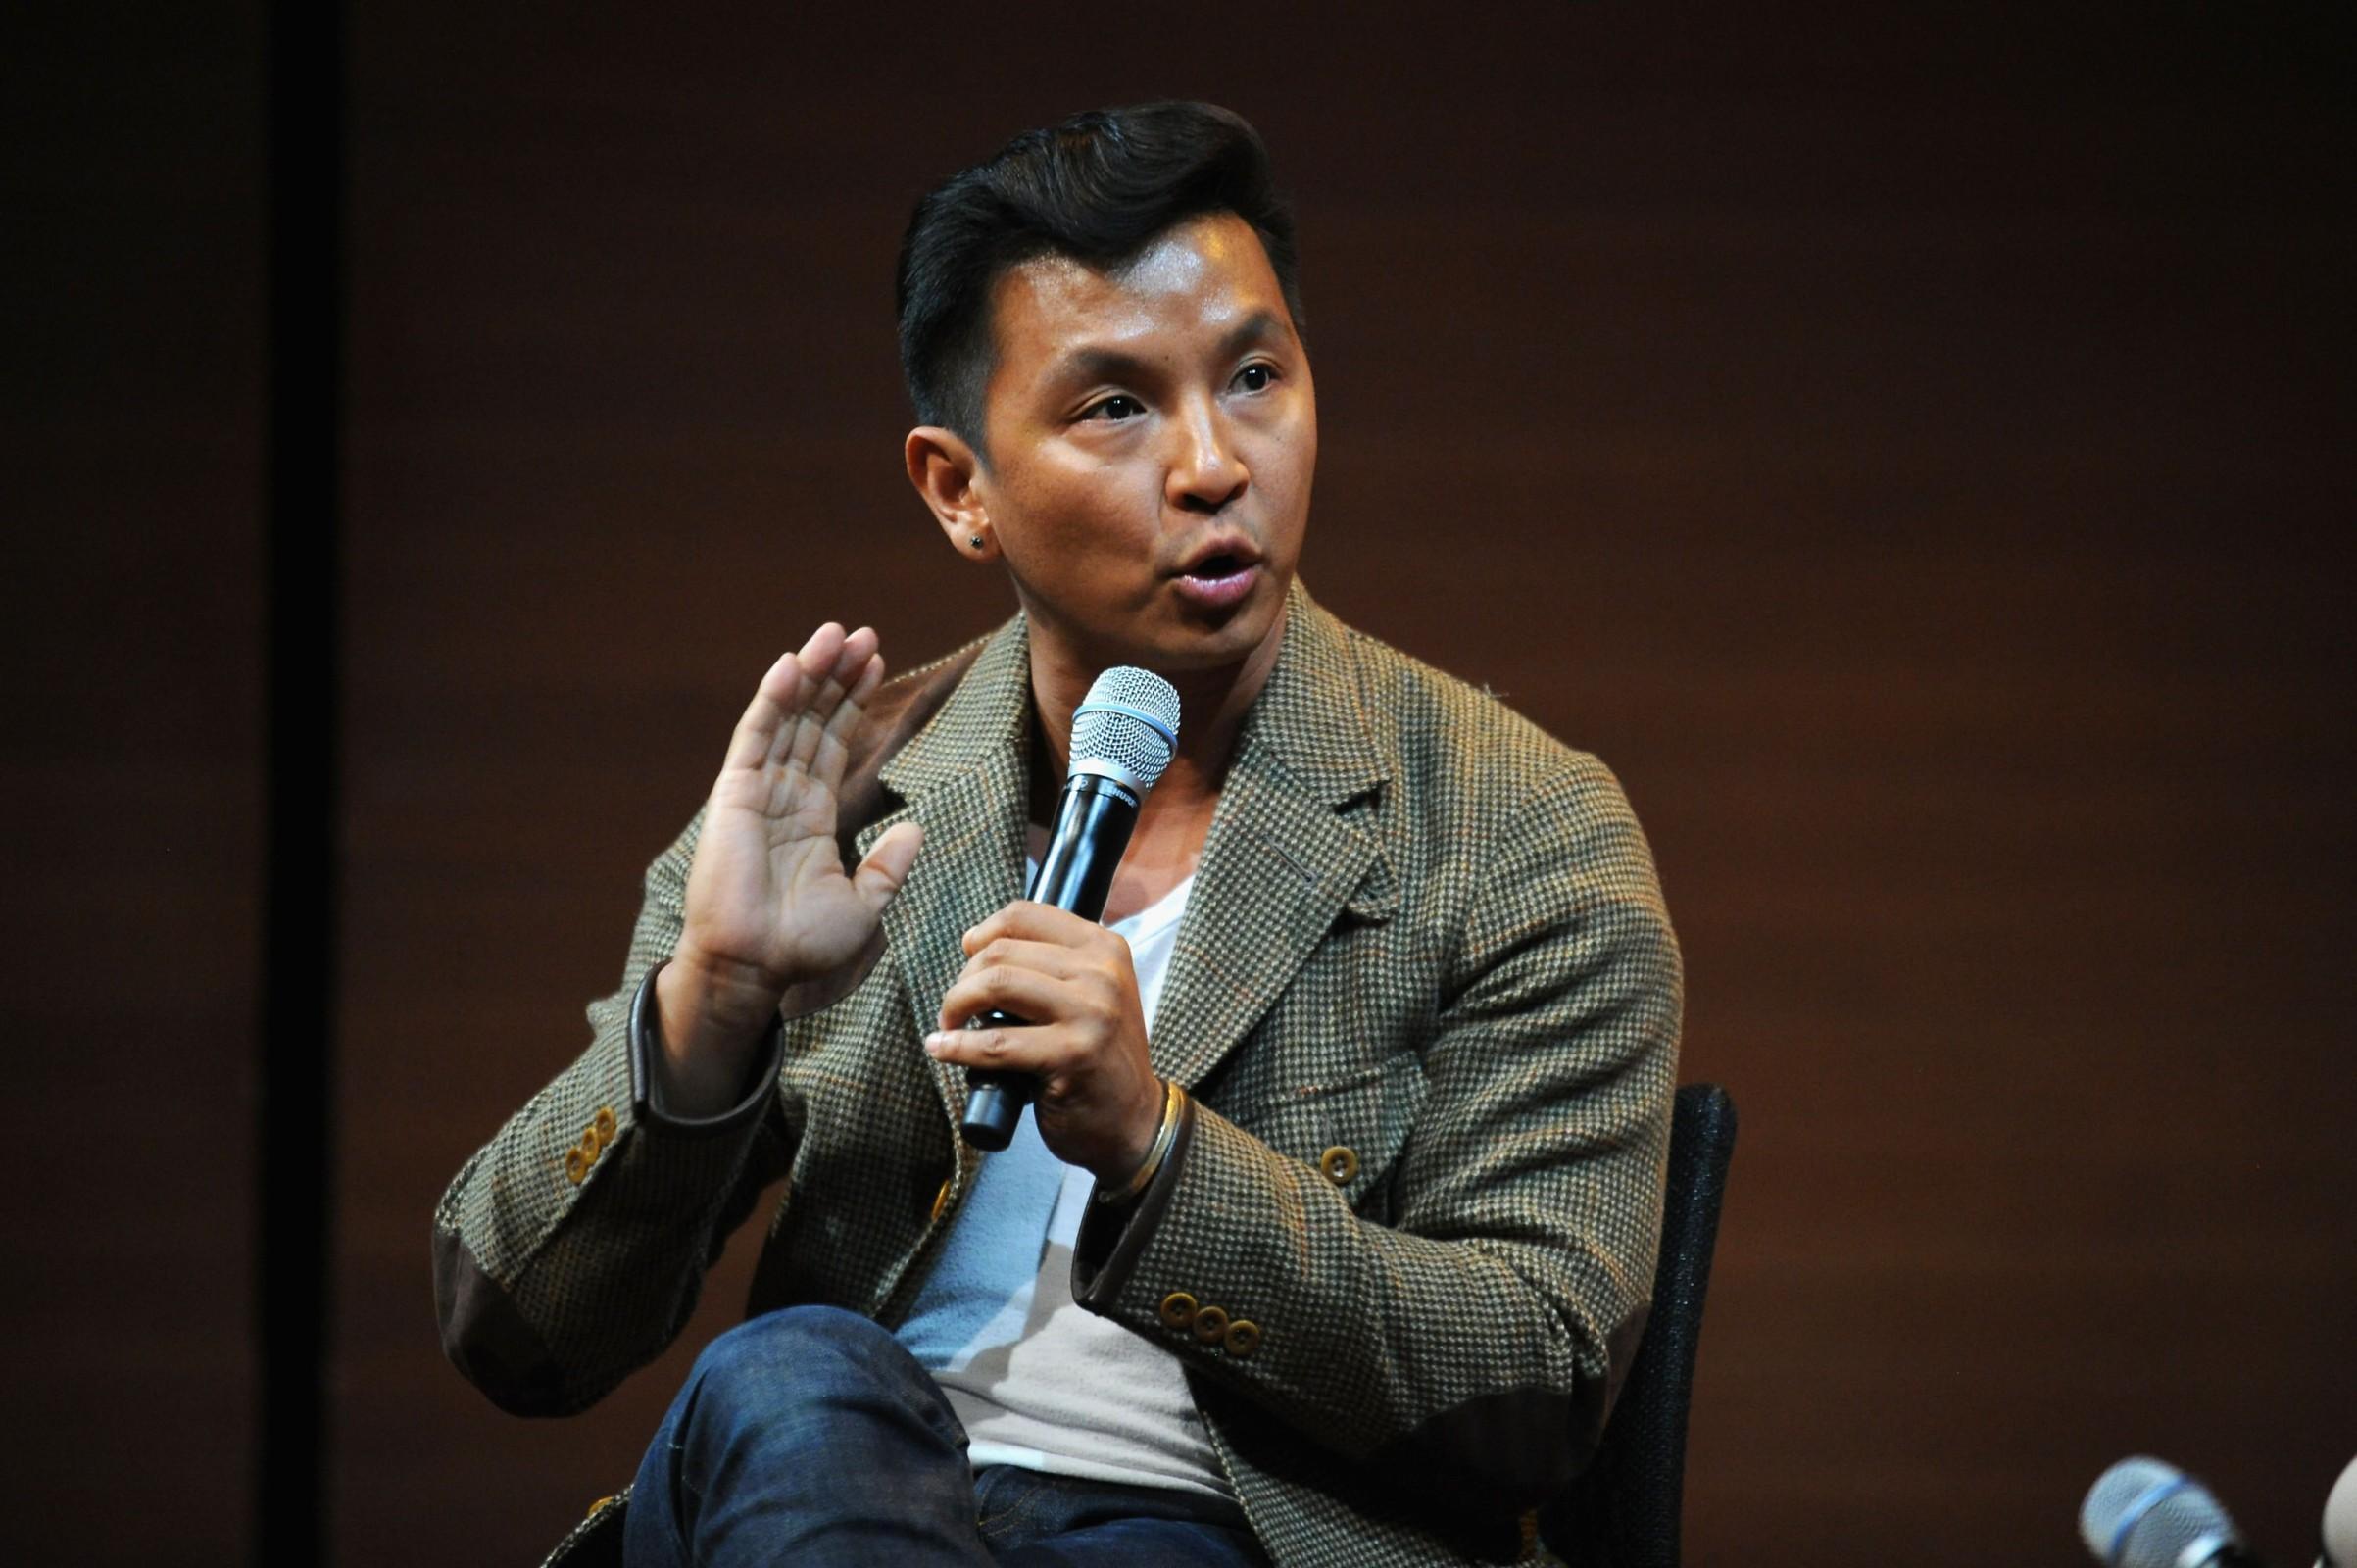 Prabal Gurung Raises Thousands for Nepal